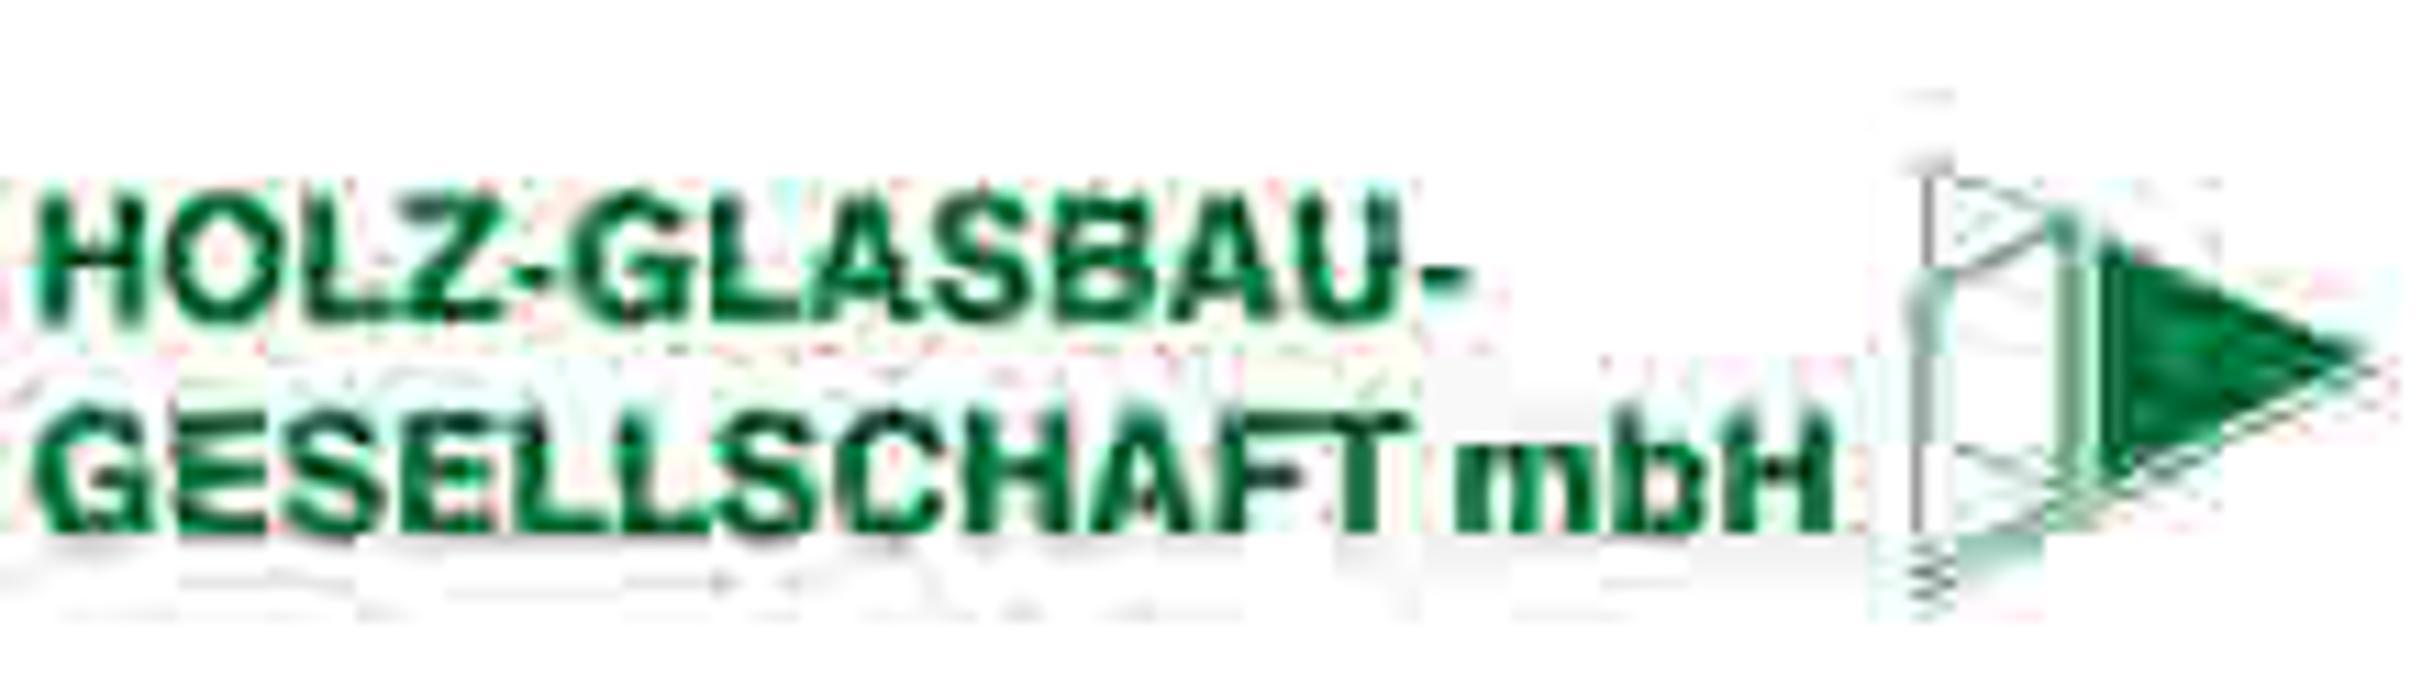 Holz Glasbaugesellschaft mbH